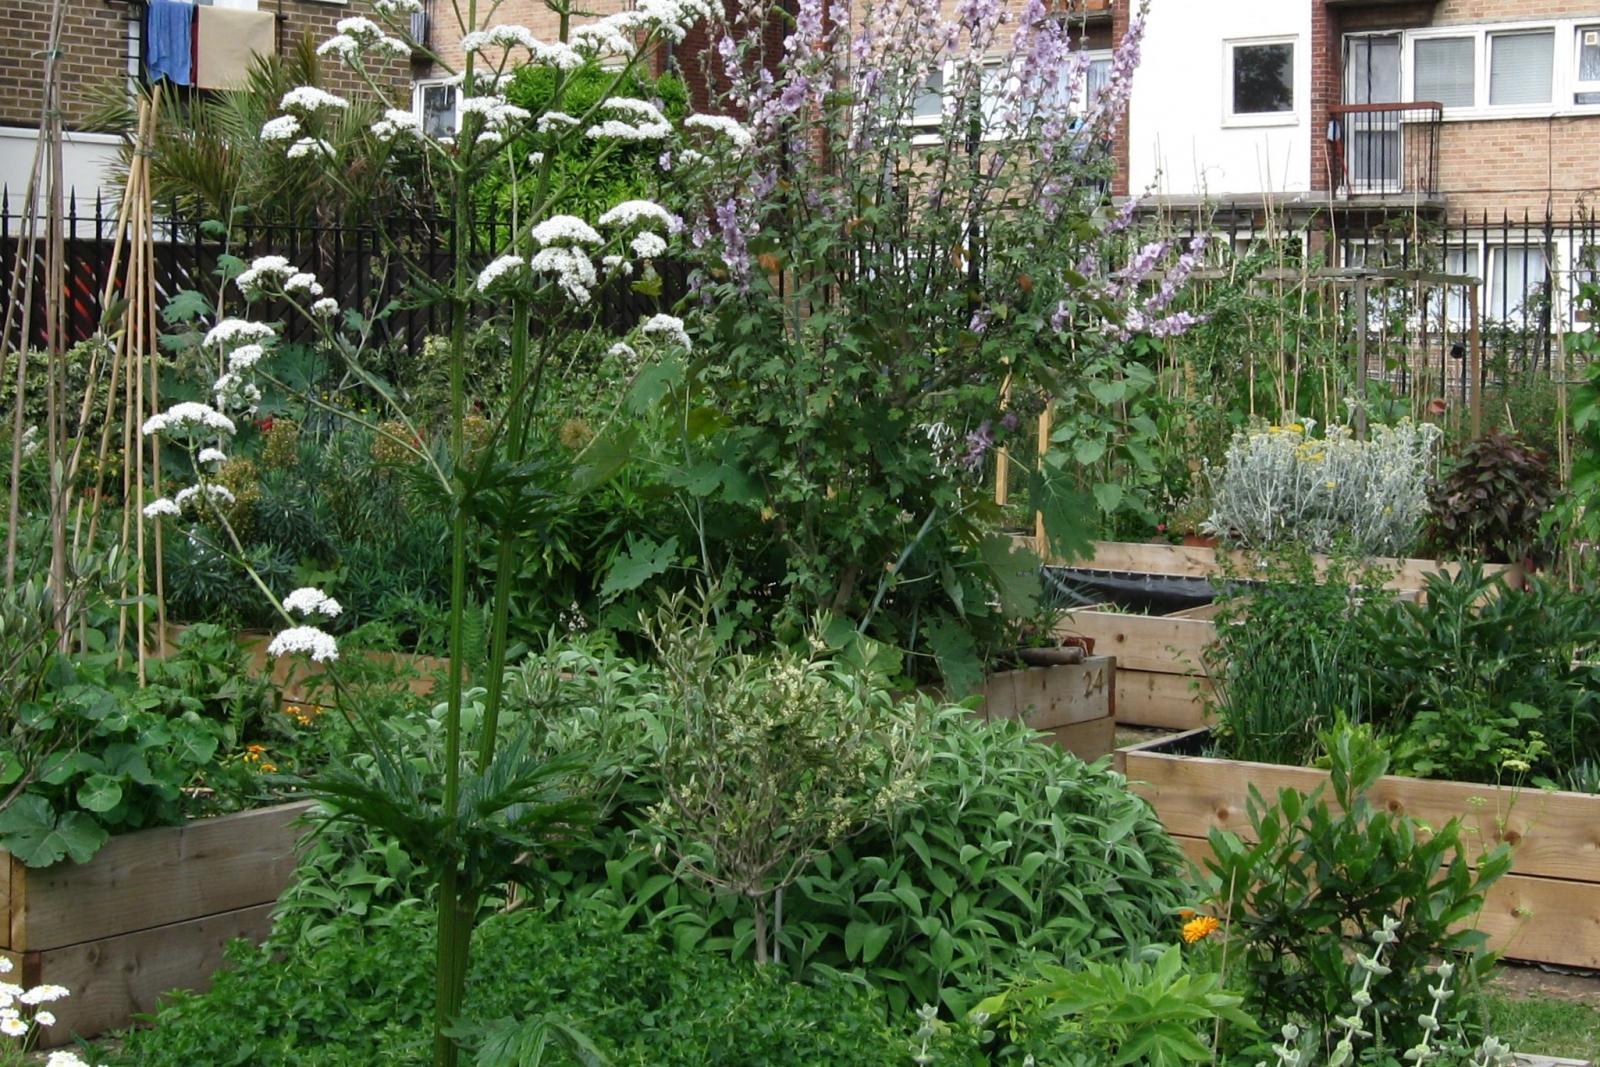 Community growing space, Credit: G Morgan